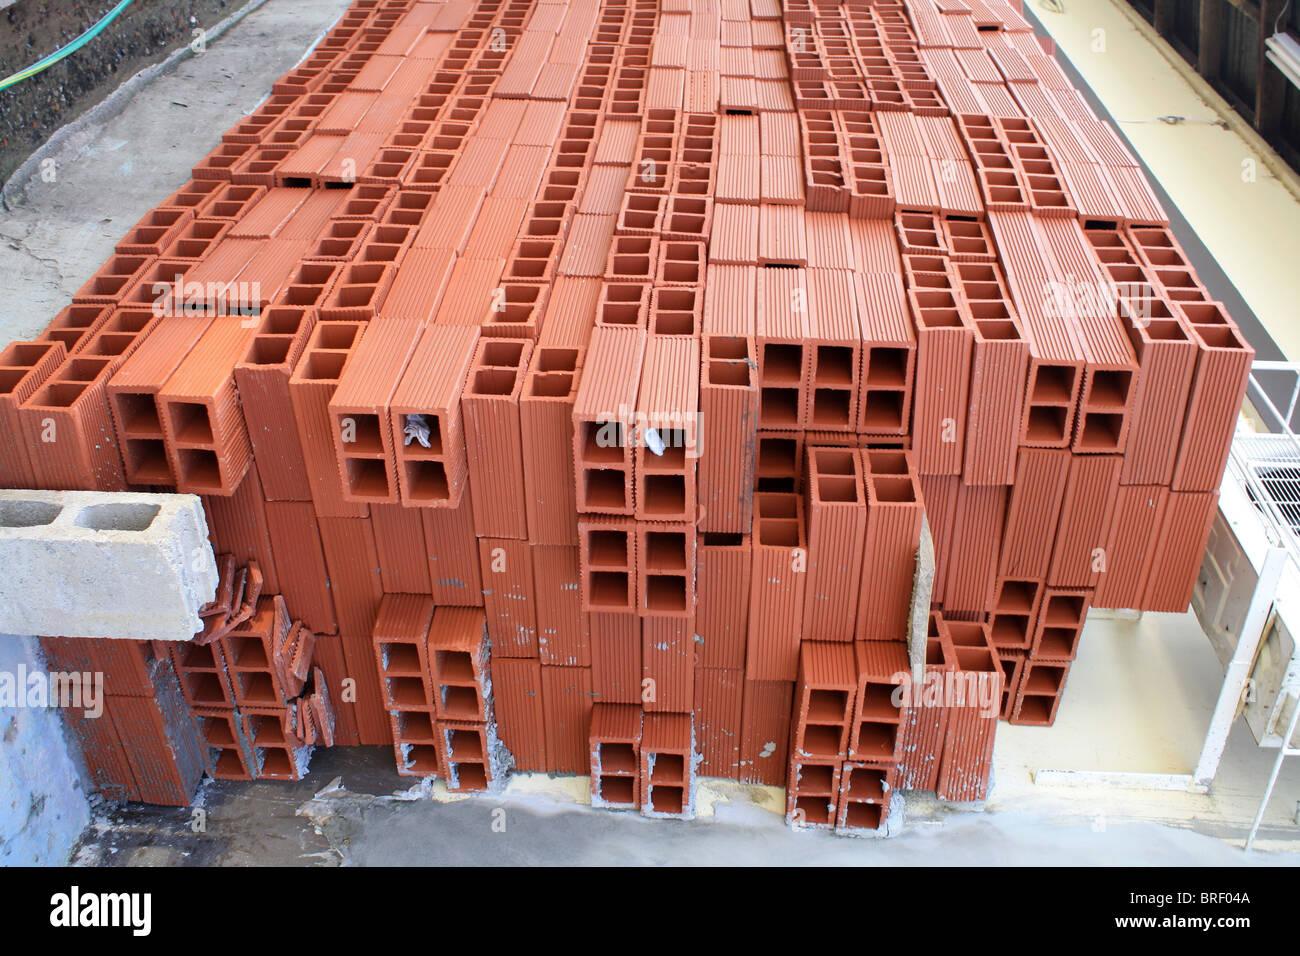 Red Bricks, Building Material. - Stock Image